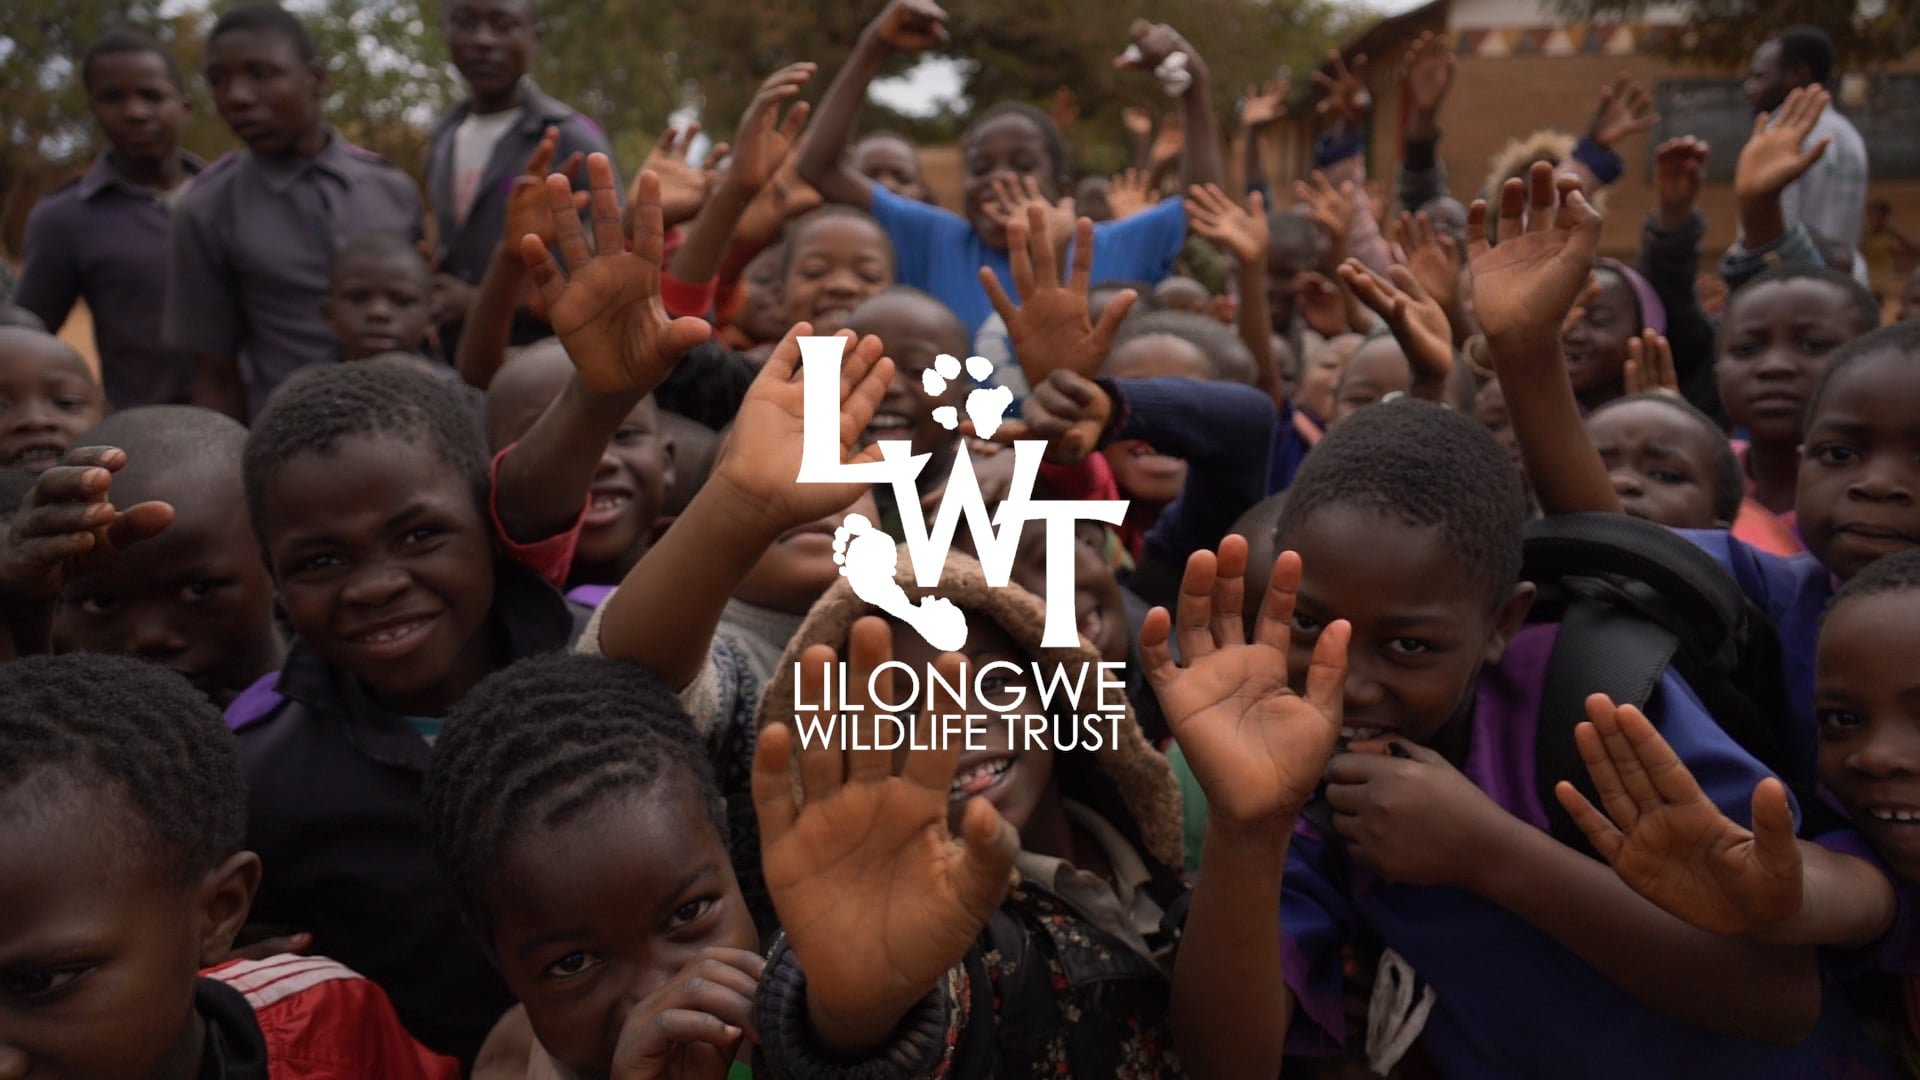 Lilongwe Wildlife Trust: Environmental Education for the Future of Malawi